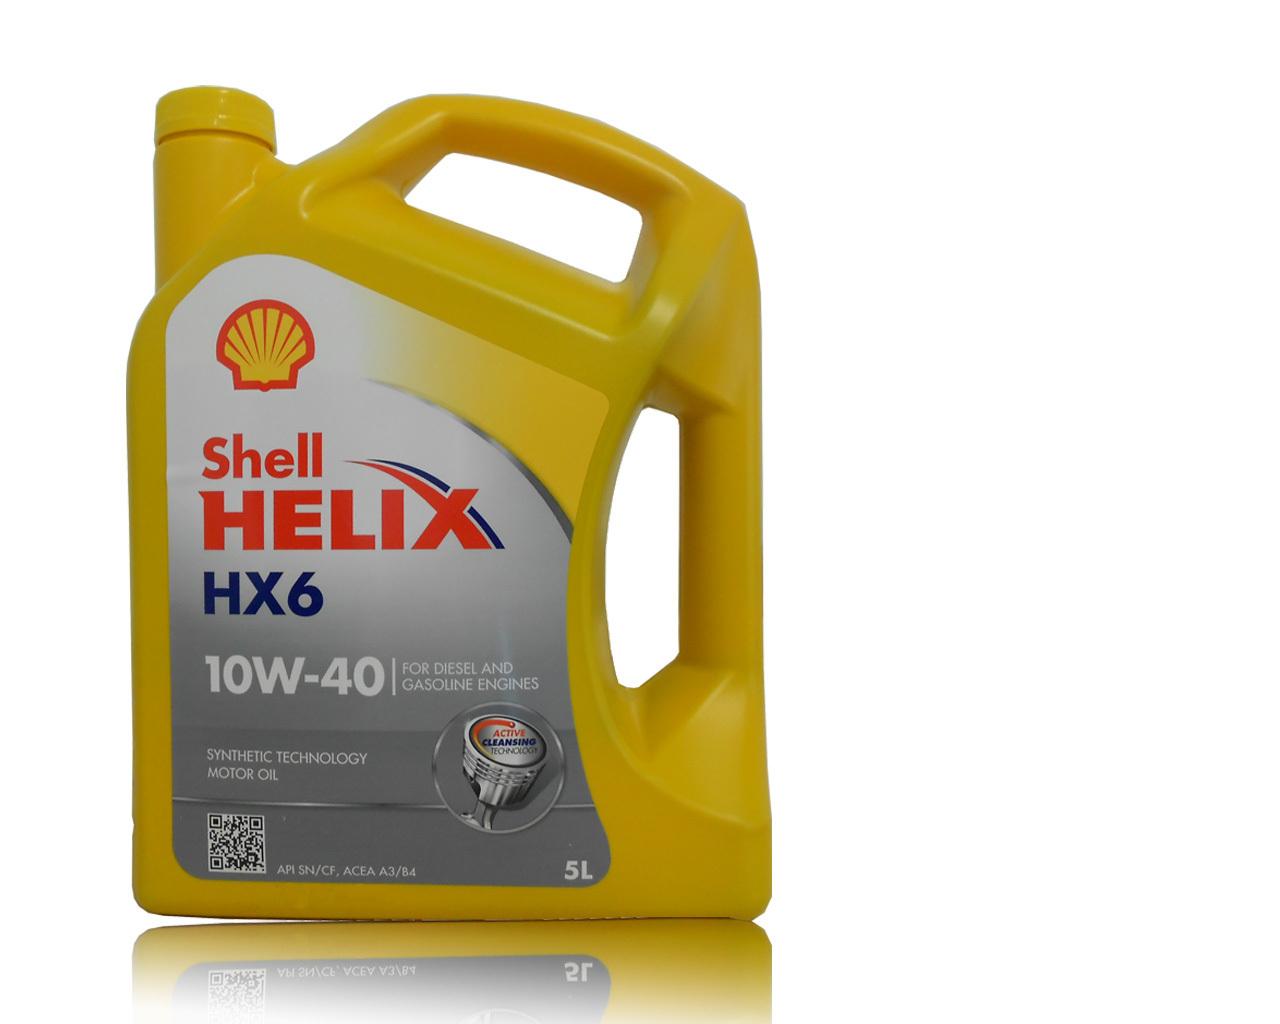 shell helix hx6 10w 40 5l b f schmierstoff gmbh. Black Bedroom Furniture Sets. Home Design Ideas